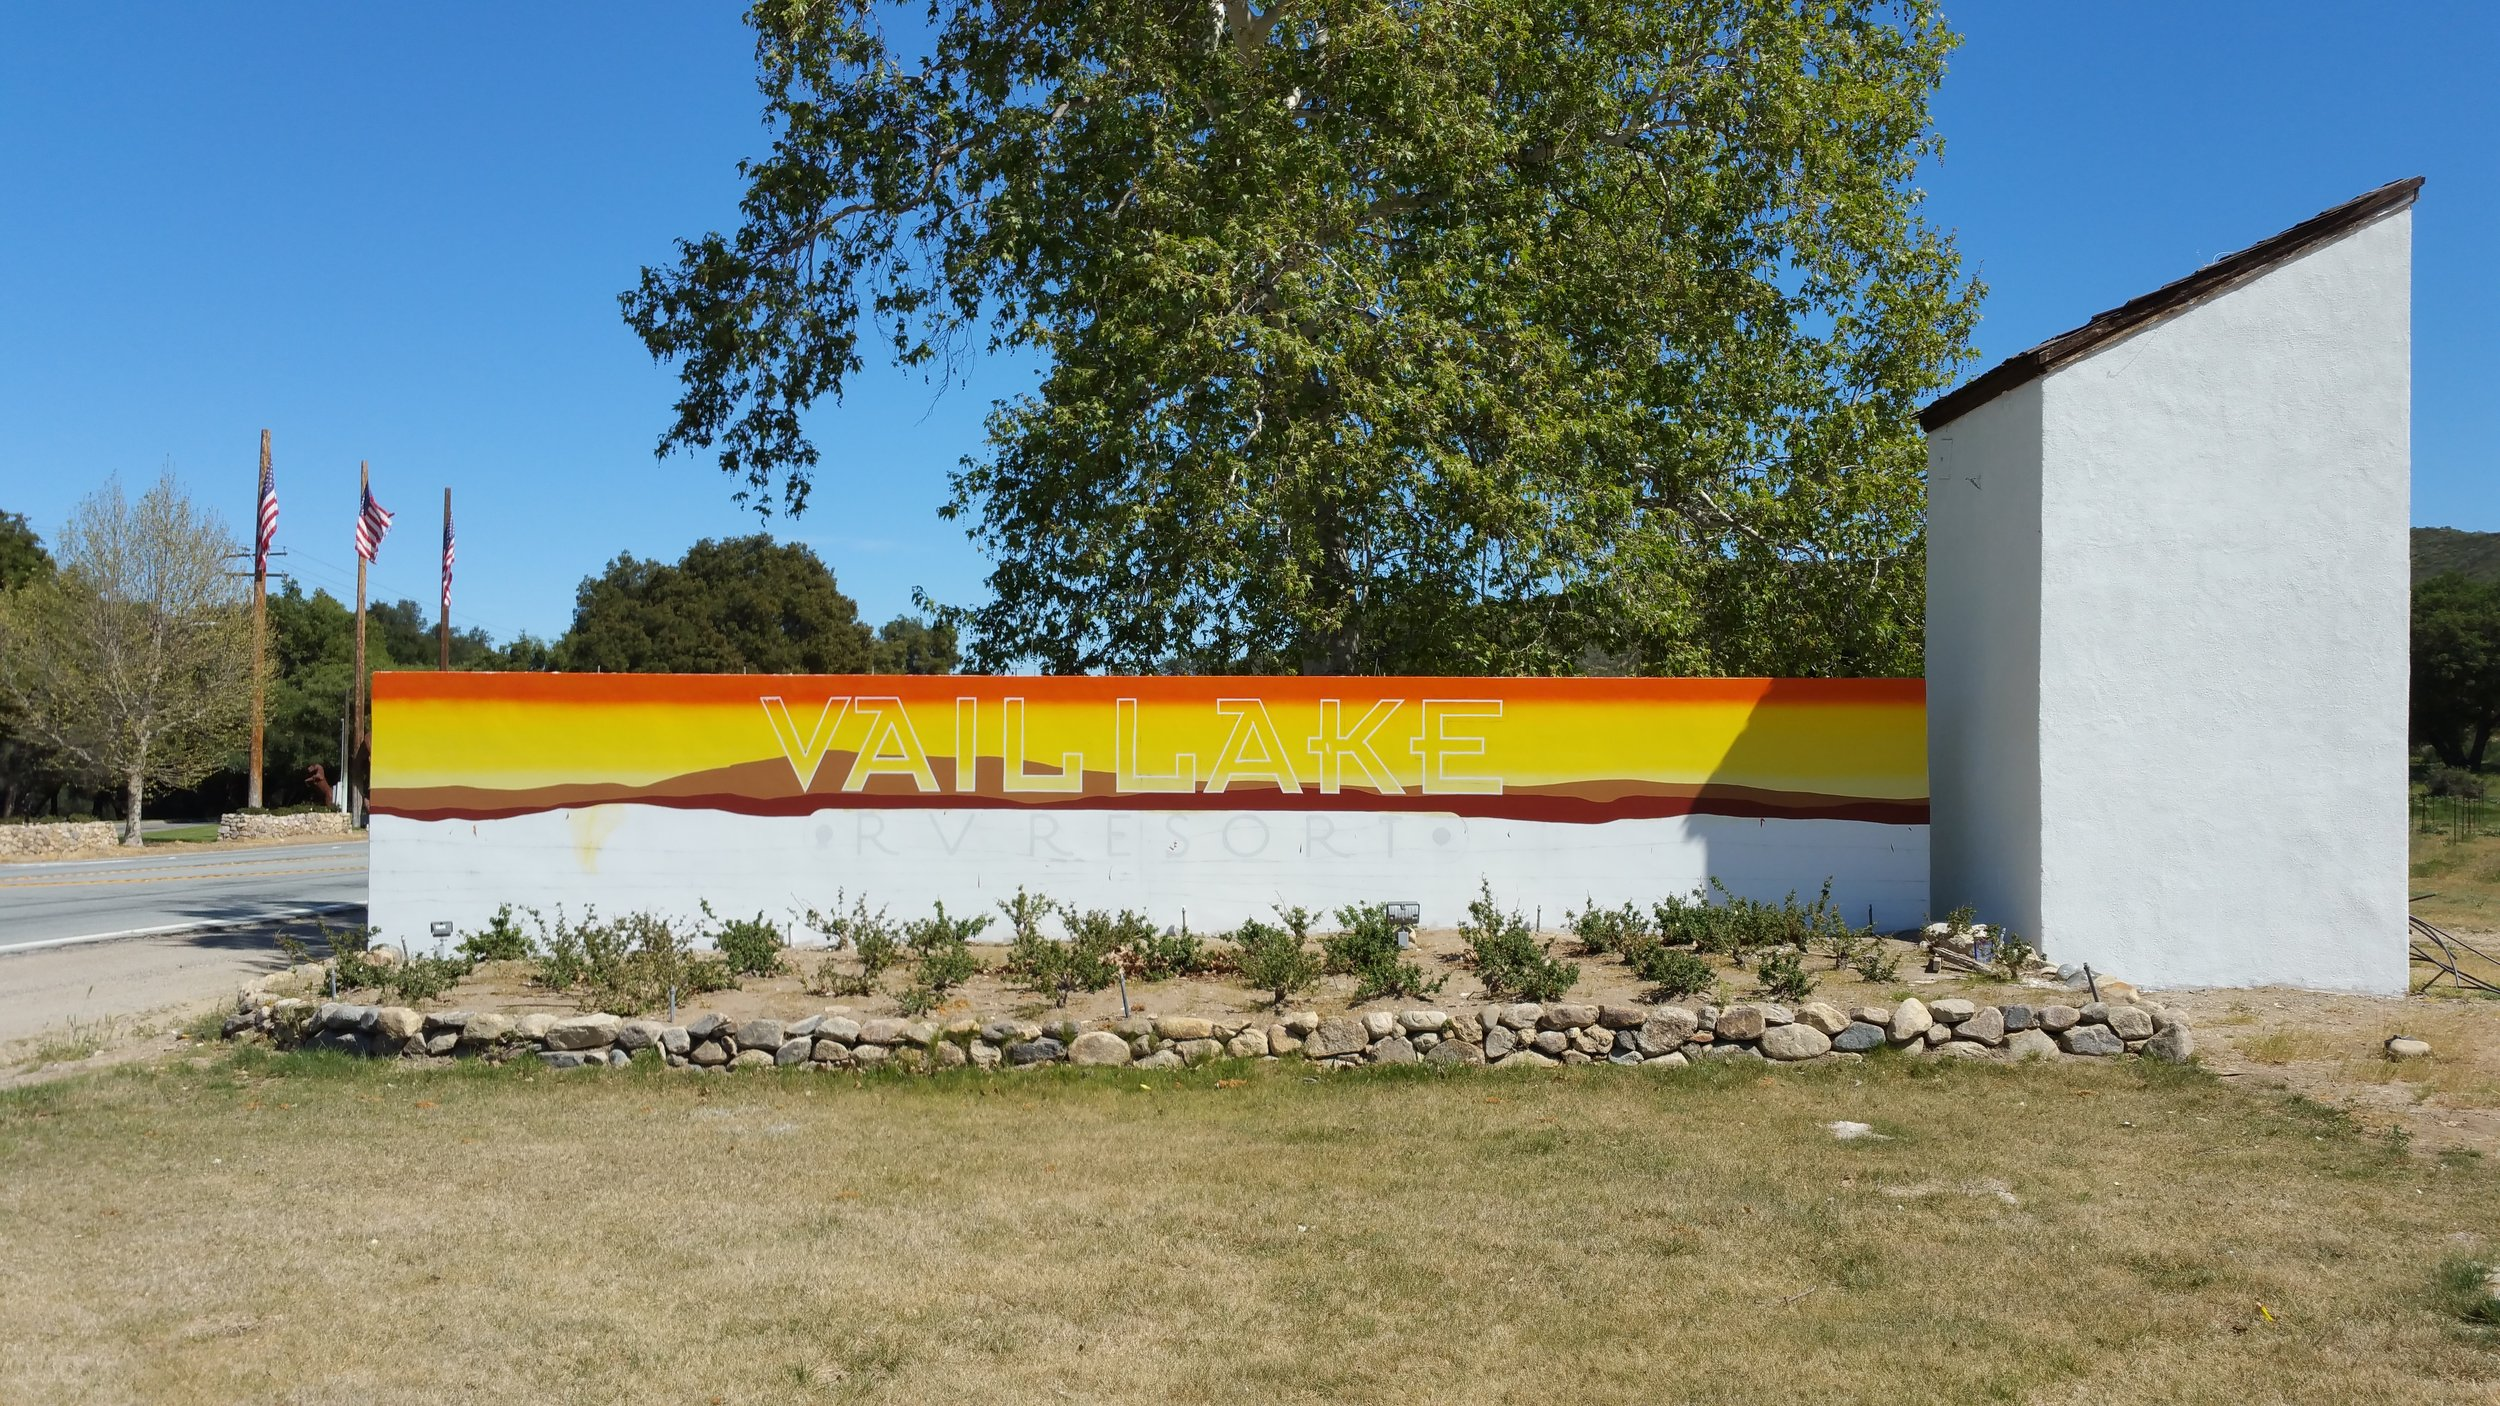 Vail Lake RV hand painted monument progress photo